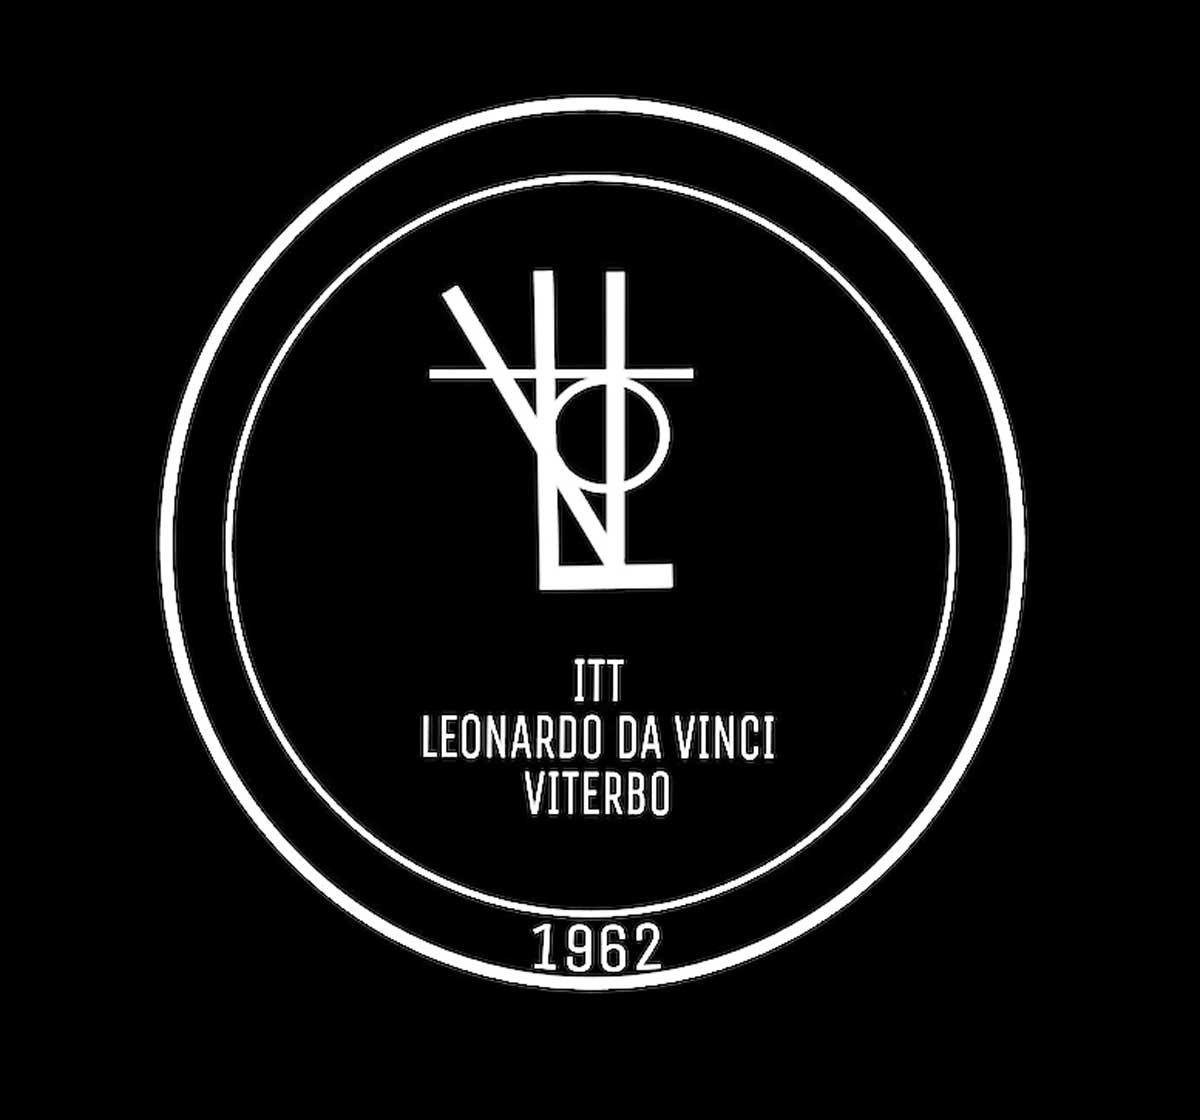 L'Itt Leonardo Da Vinci